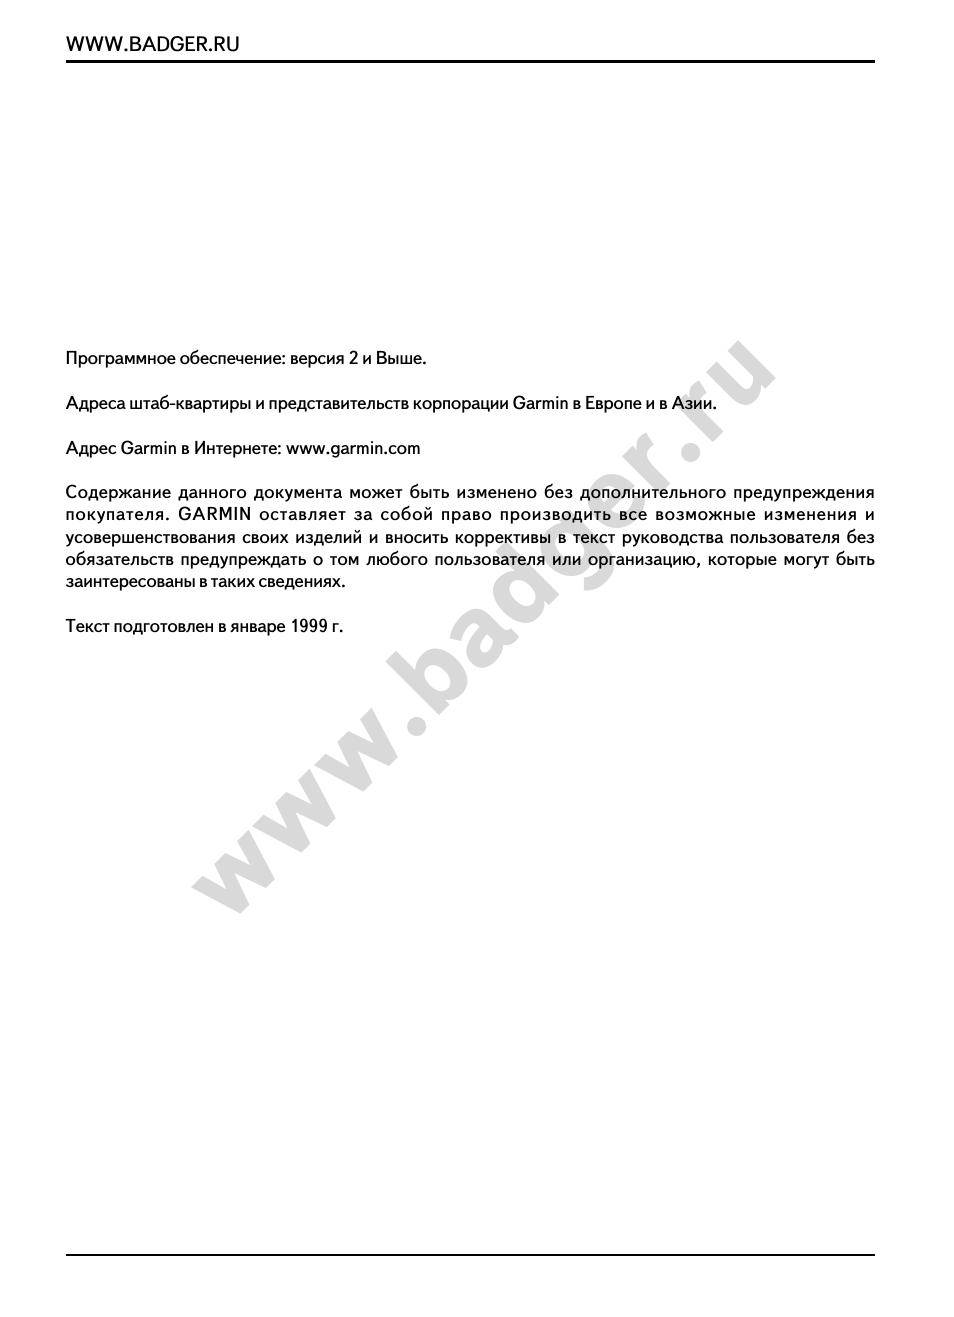 www.badger.ru WWW.BADGER.RU Программное обеспечение: версия.